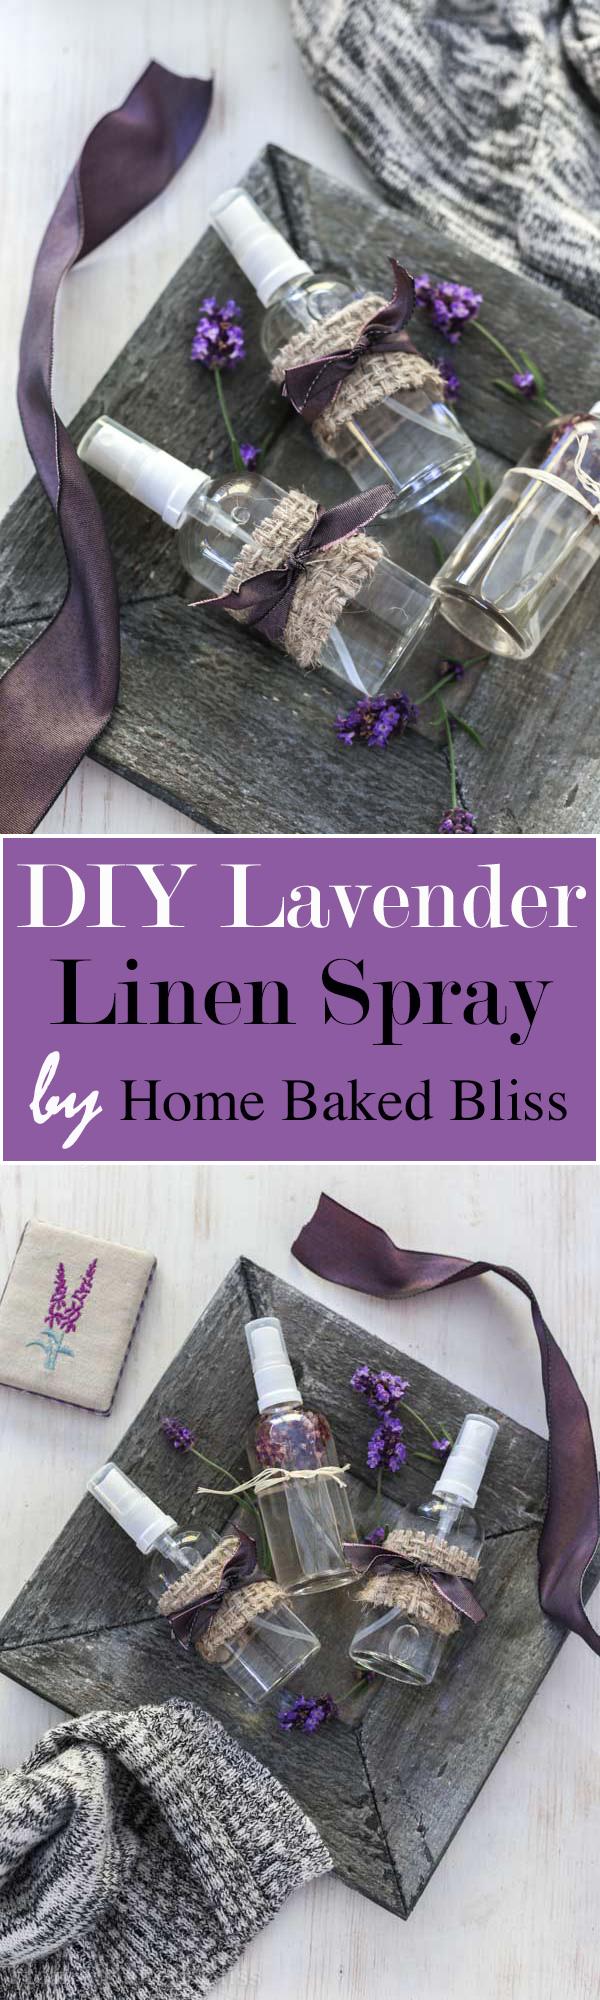 A sleep promoting and calming DIY Lavender Linen Spray.